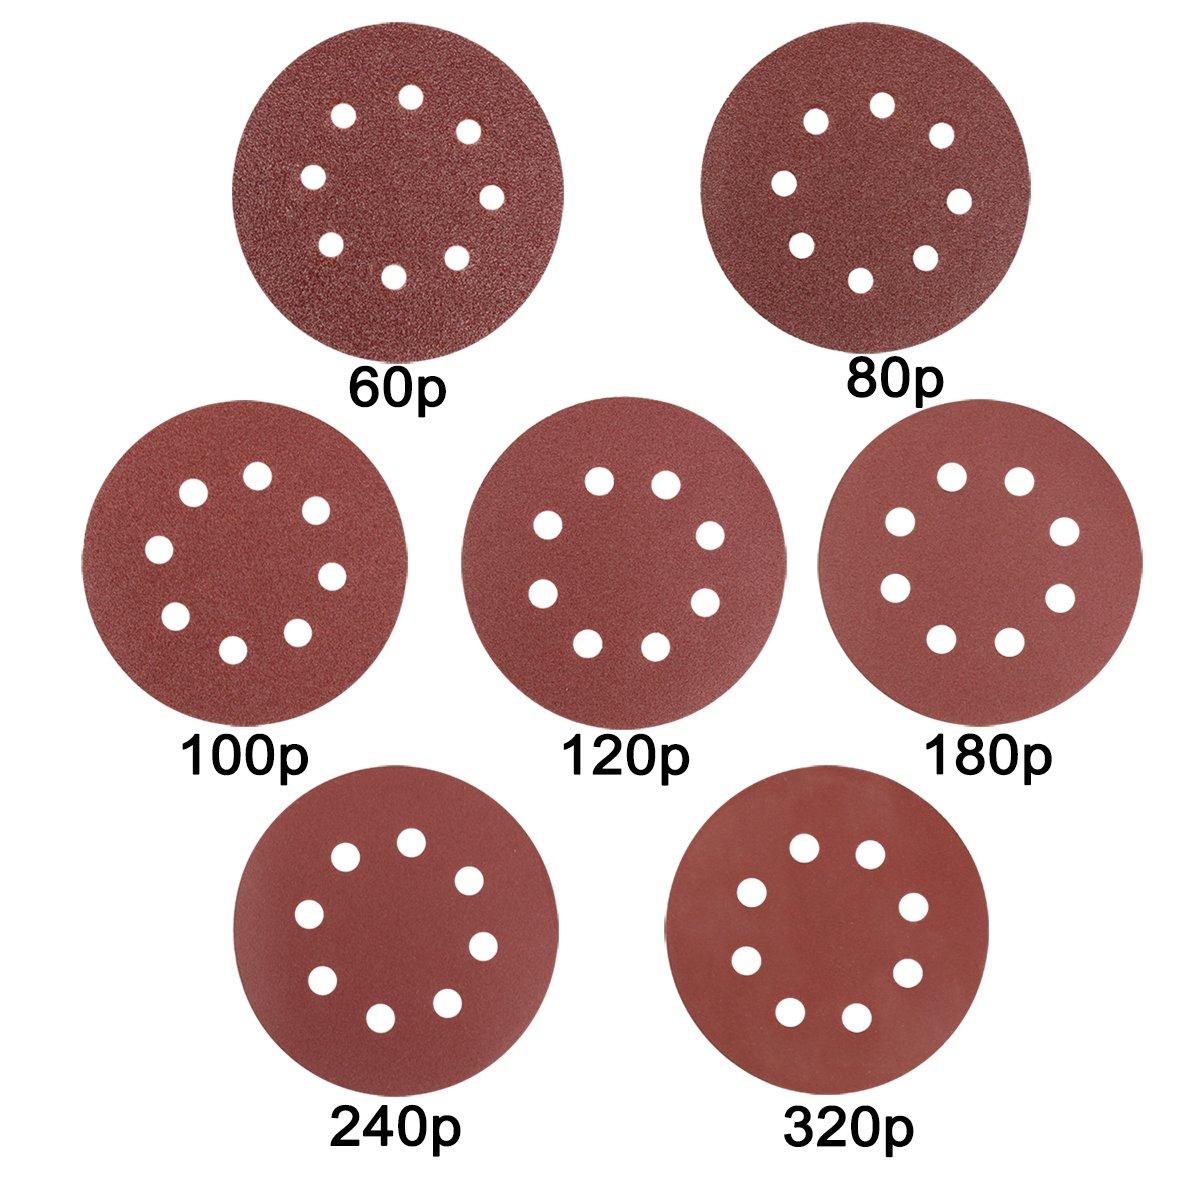 Naisidier 70Pcs 8 Holes Sanding Discs 5inch Hook and Loop Sandpaper Sanding Sheets Assorted 60/80/100/120/180/240/320 Grit for Random Orbital Sander